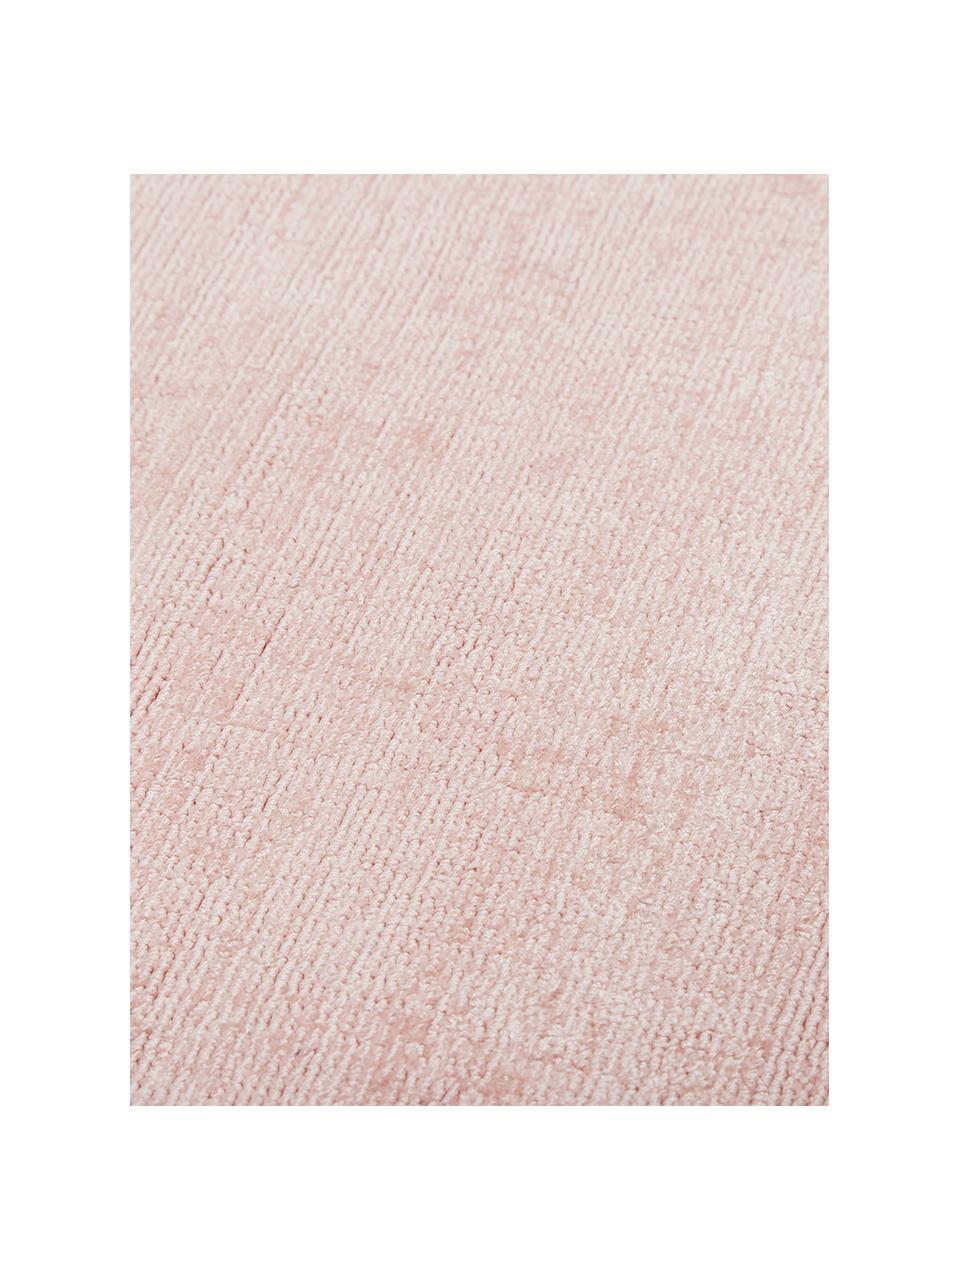 Handgewebter Viskoseteppich Jane in Rosa, Flor: 100% Viskose, Rosa, B 120 x L 180 cm (Größe S)